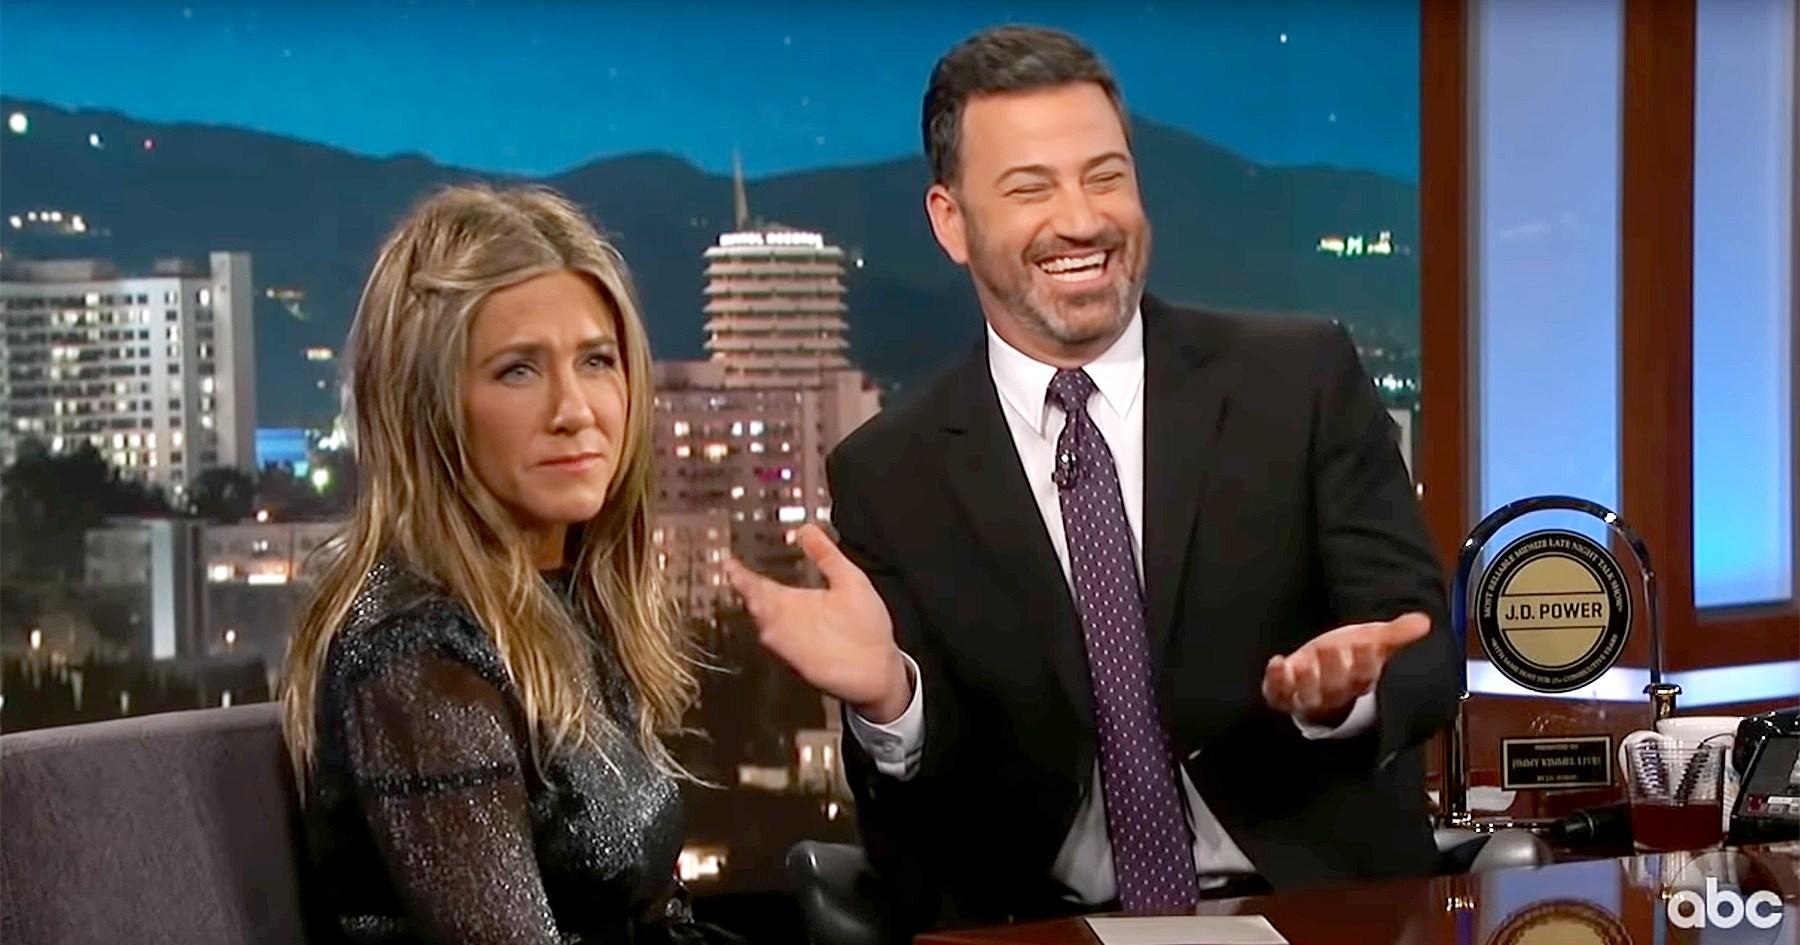 Jimmy Kimmel's Daughter Jane Pooped in Jennifer Aniston's Yard